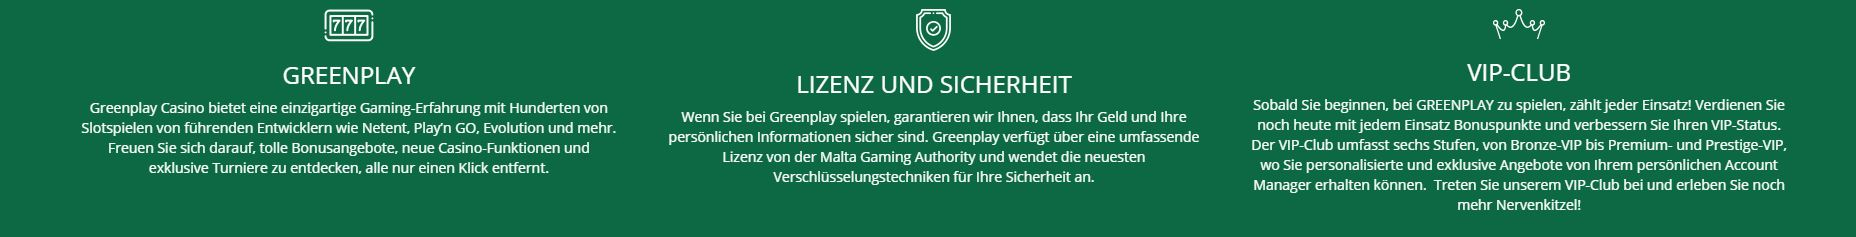 Greenplay Casino Infos